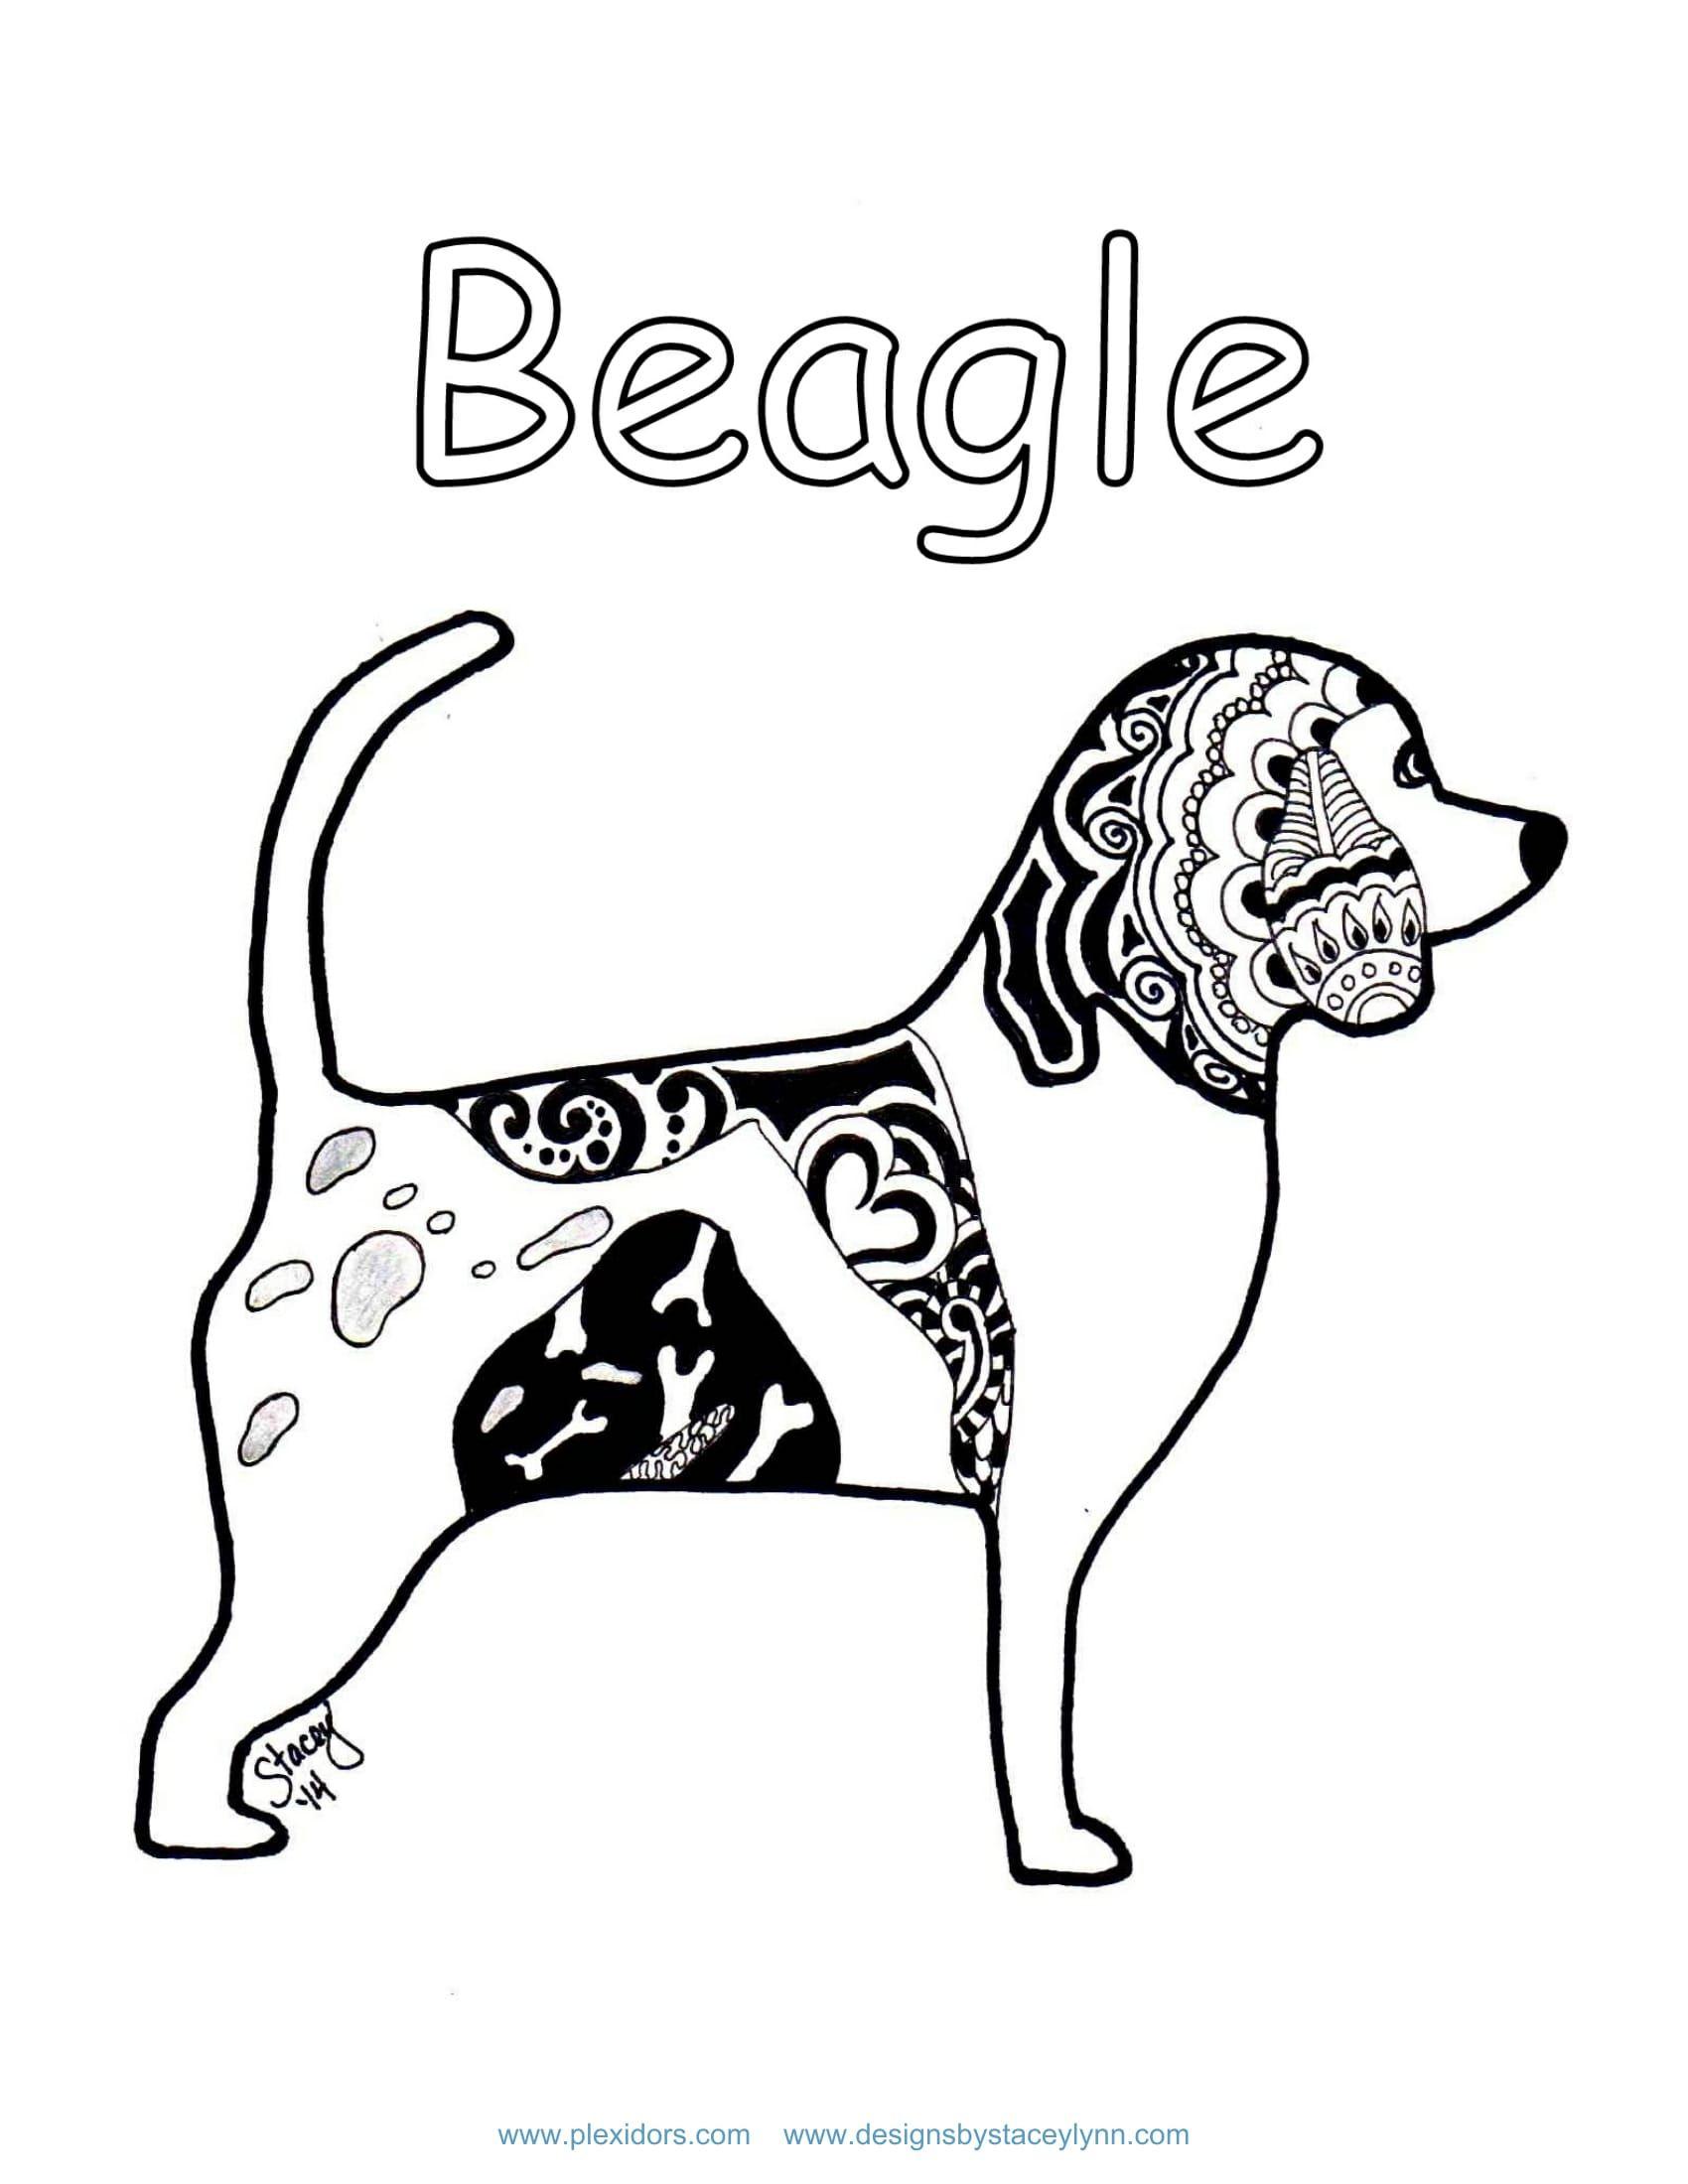 Beagle Coloring Page Plexidor Activity Book Pg 2 Pet Doors